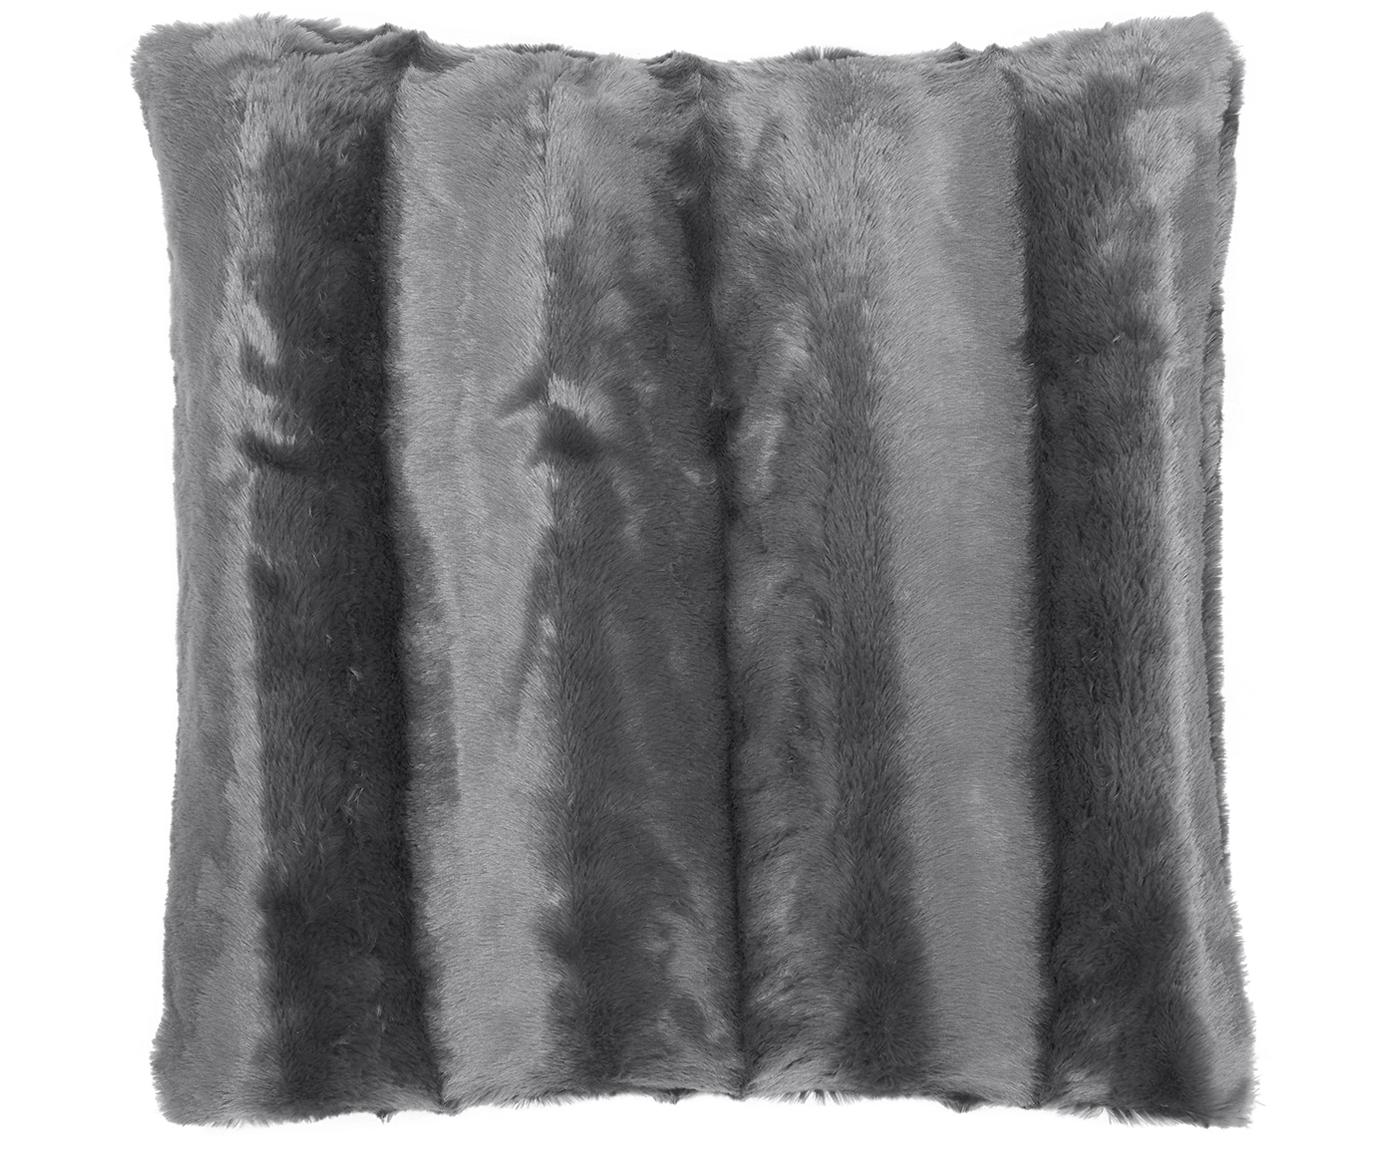 Funda de cojín de piel sintética Alva, 100%poliéster (piel sintética), Gris oscuro, An 45 x L 45 cm